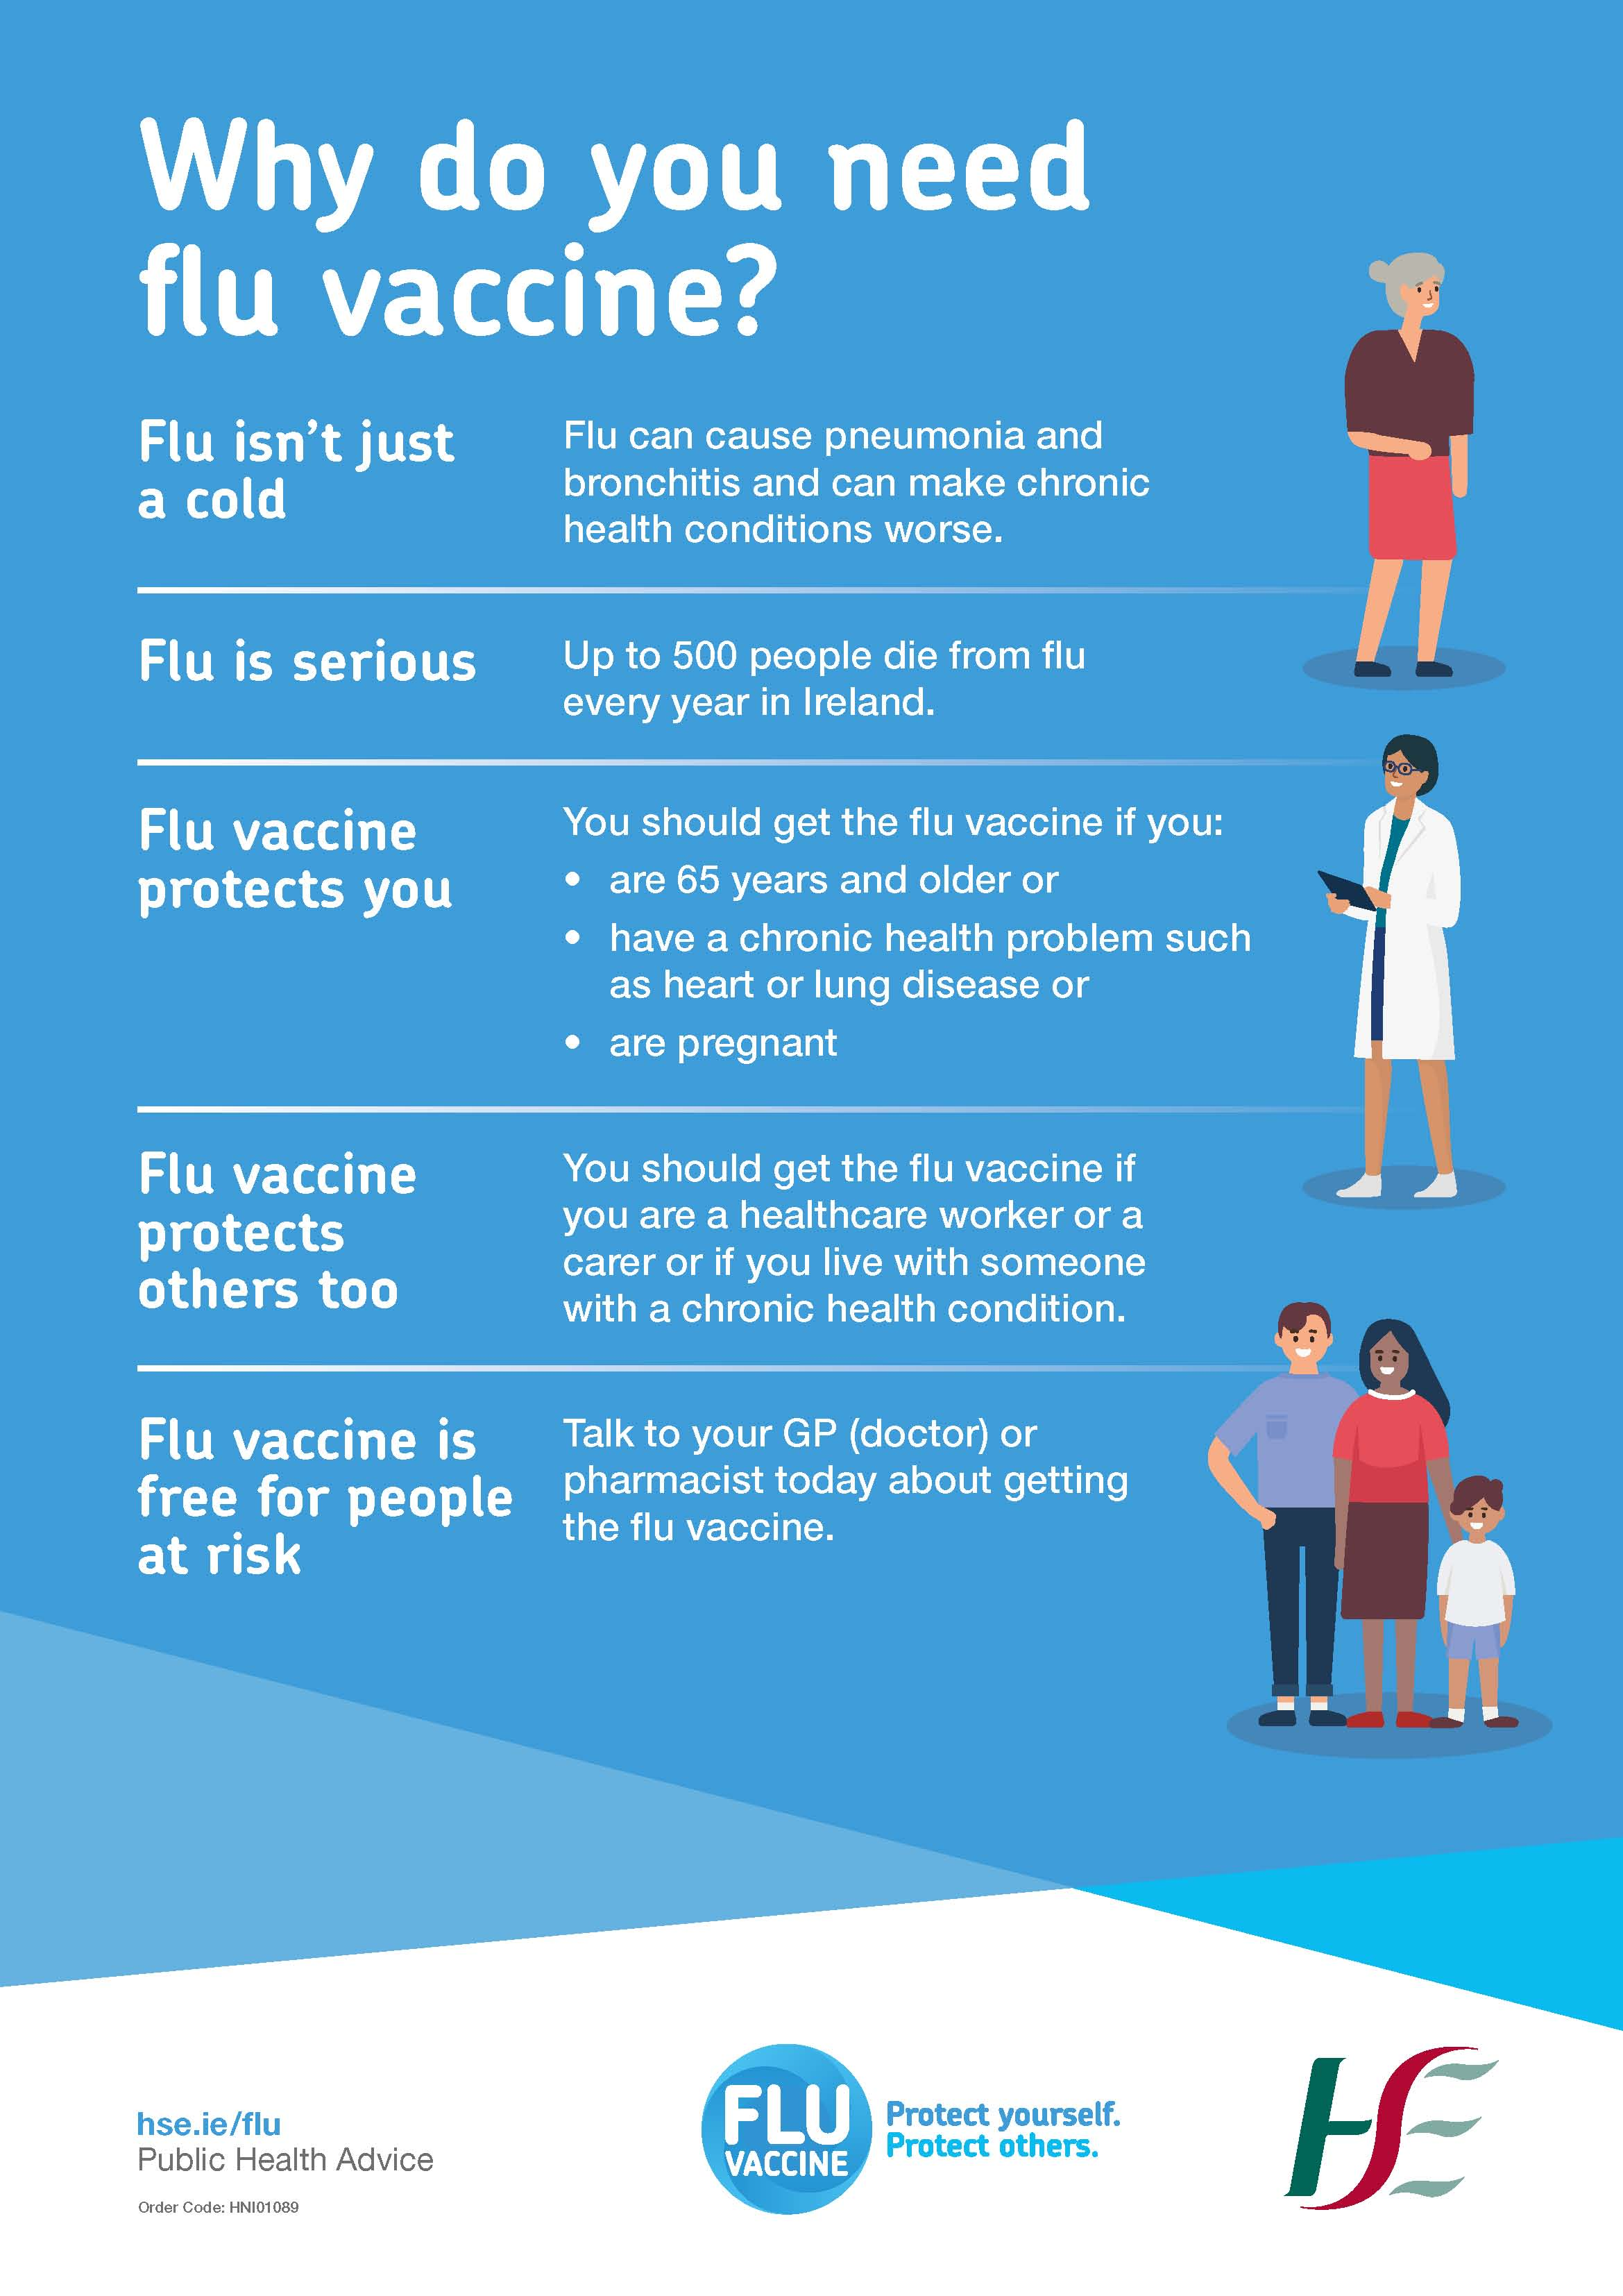 flu-facts-image